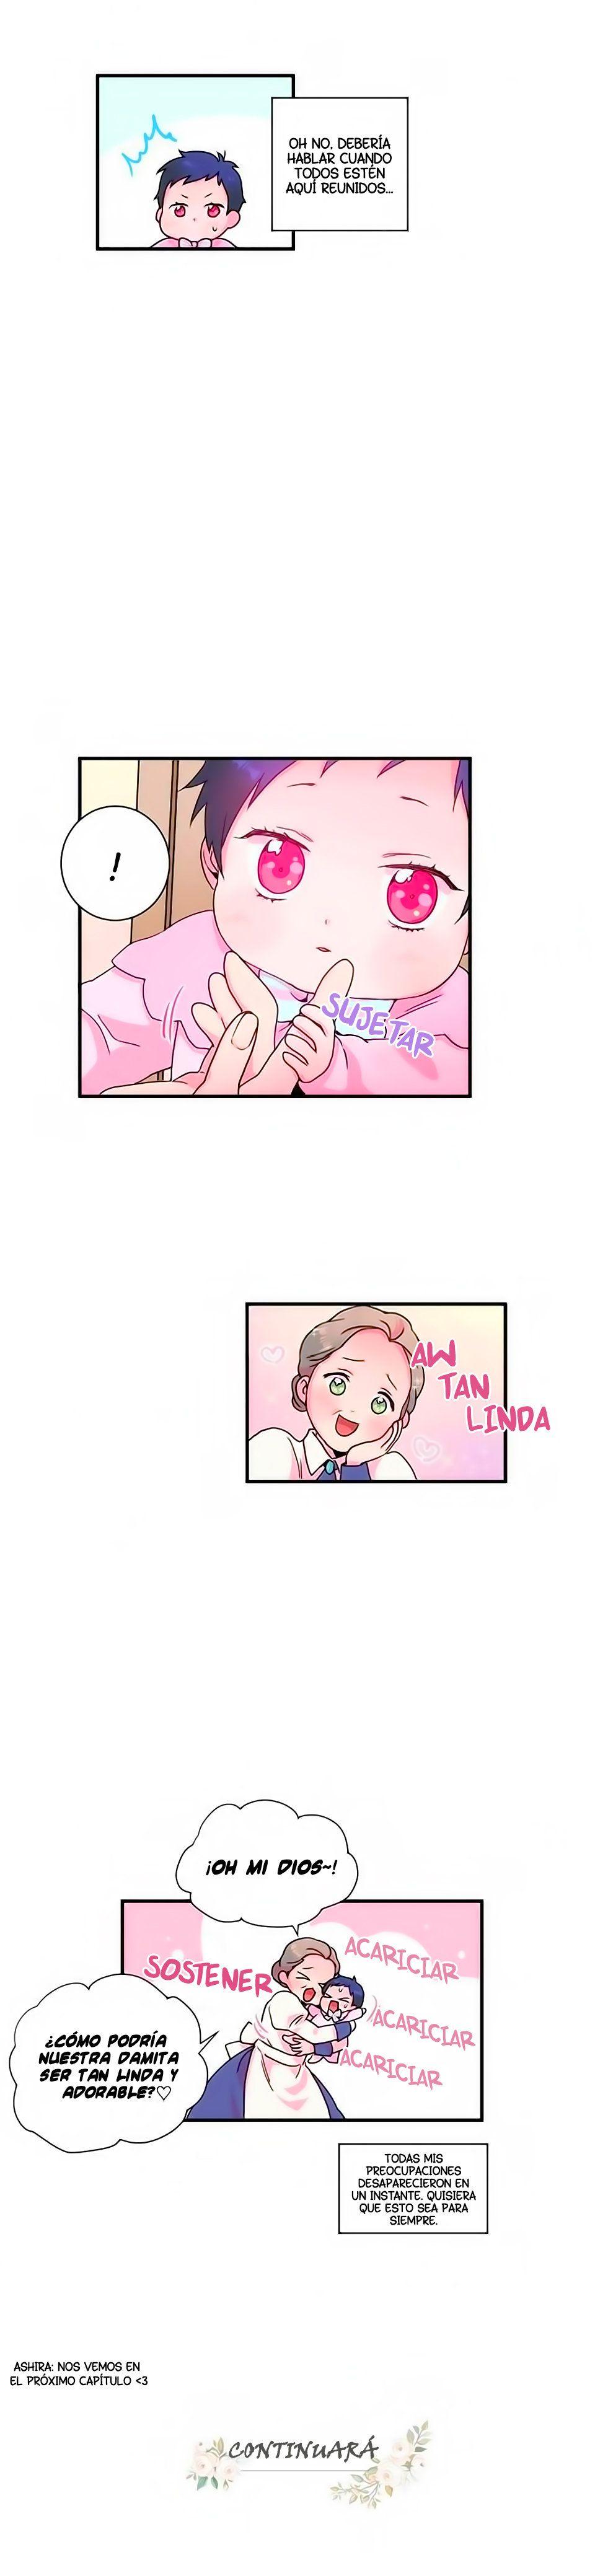 La Dama Bebe Capitulo 8 00 My Life Fansub Mangas Romanticos